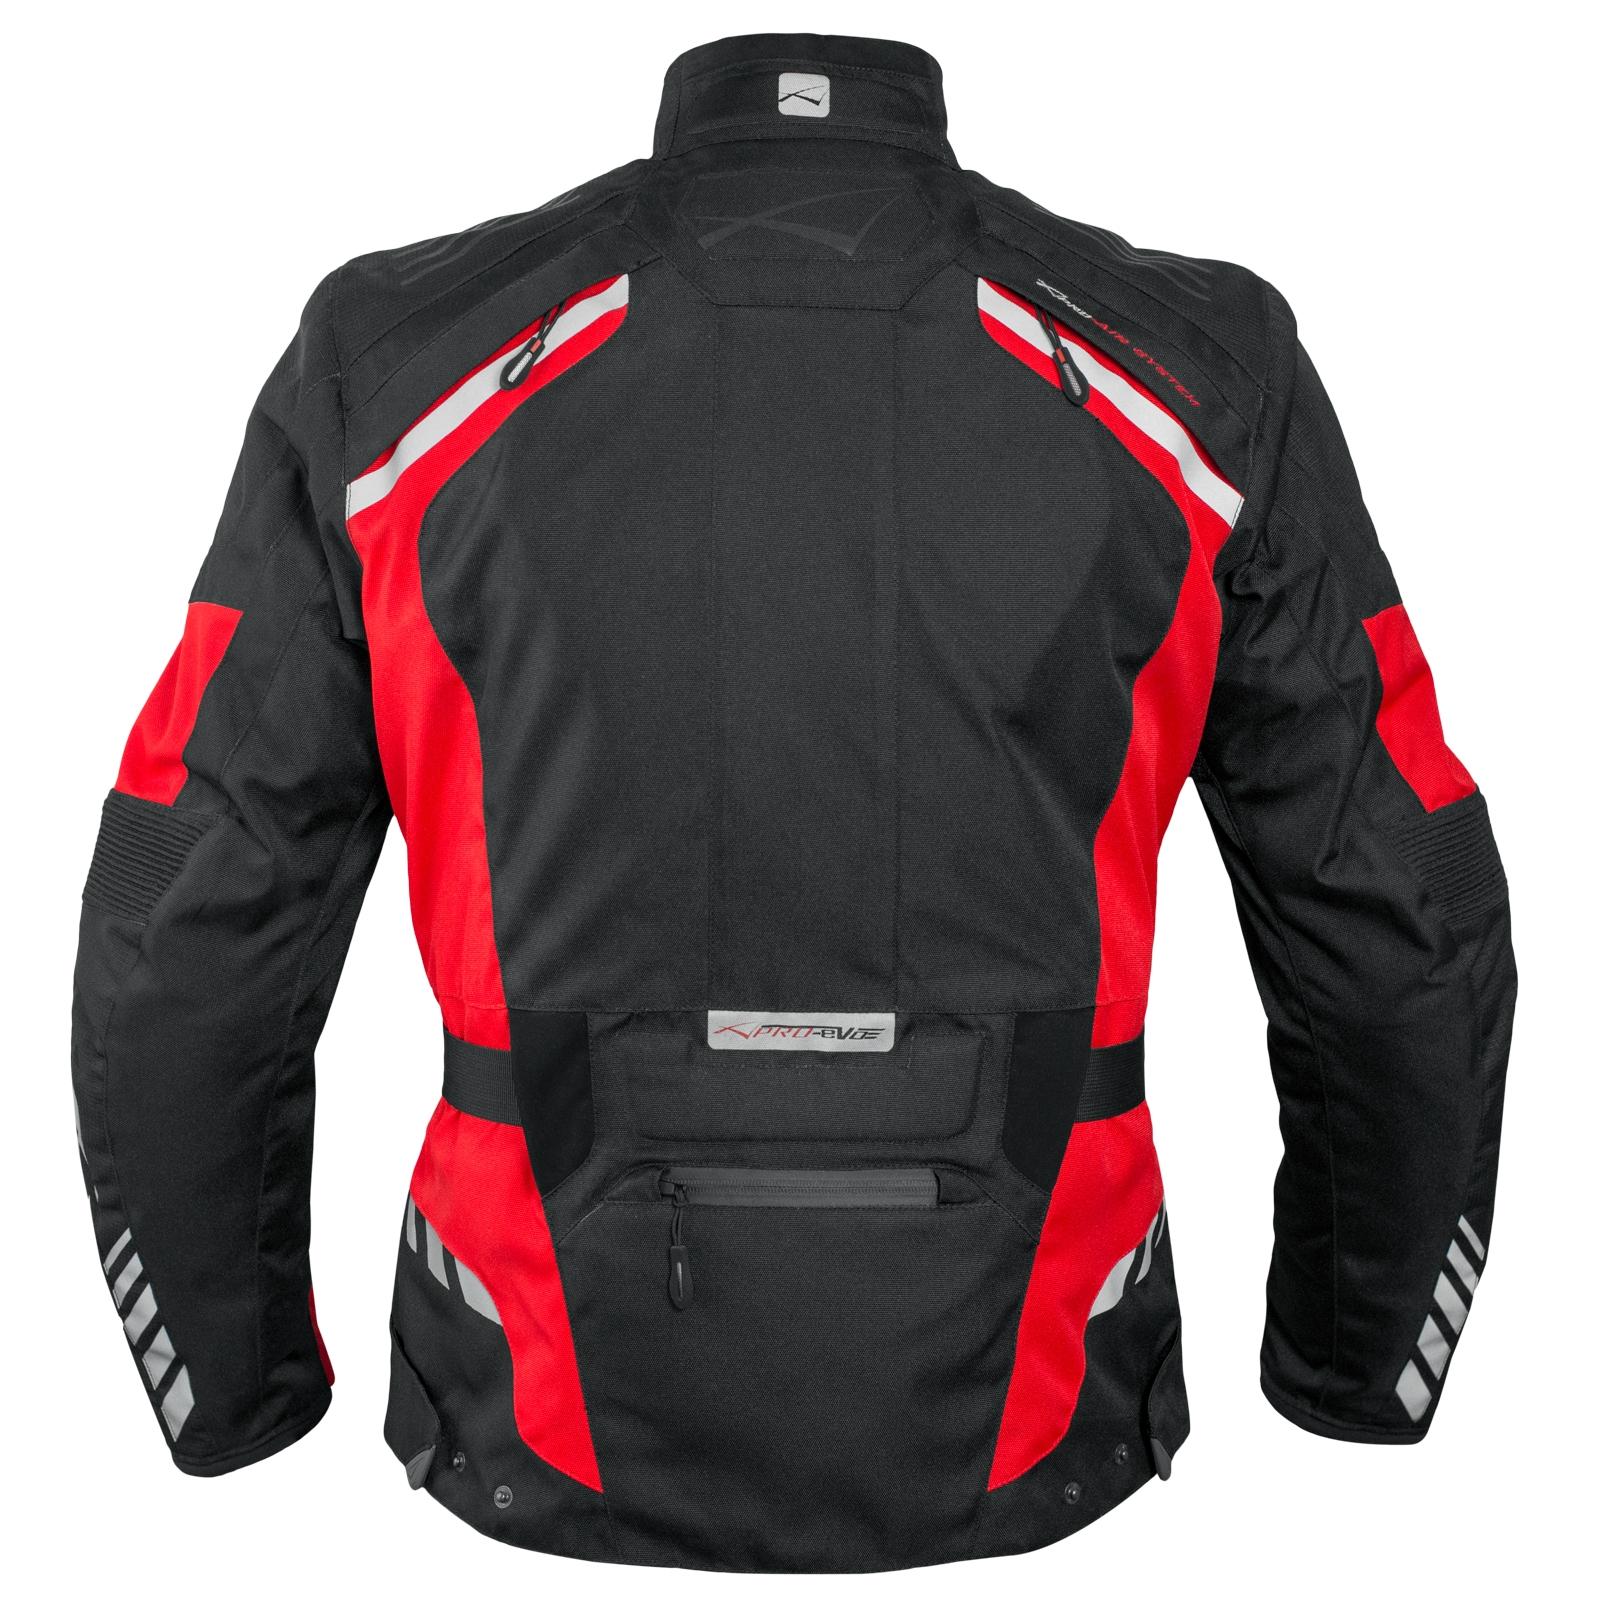 Blouson-Moto-Tissu-Veste-Impermeable-Doublure-Hivernale-Reflechissant-Respirant miniature 20